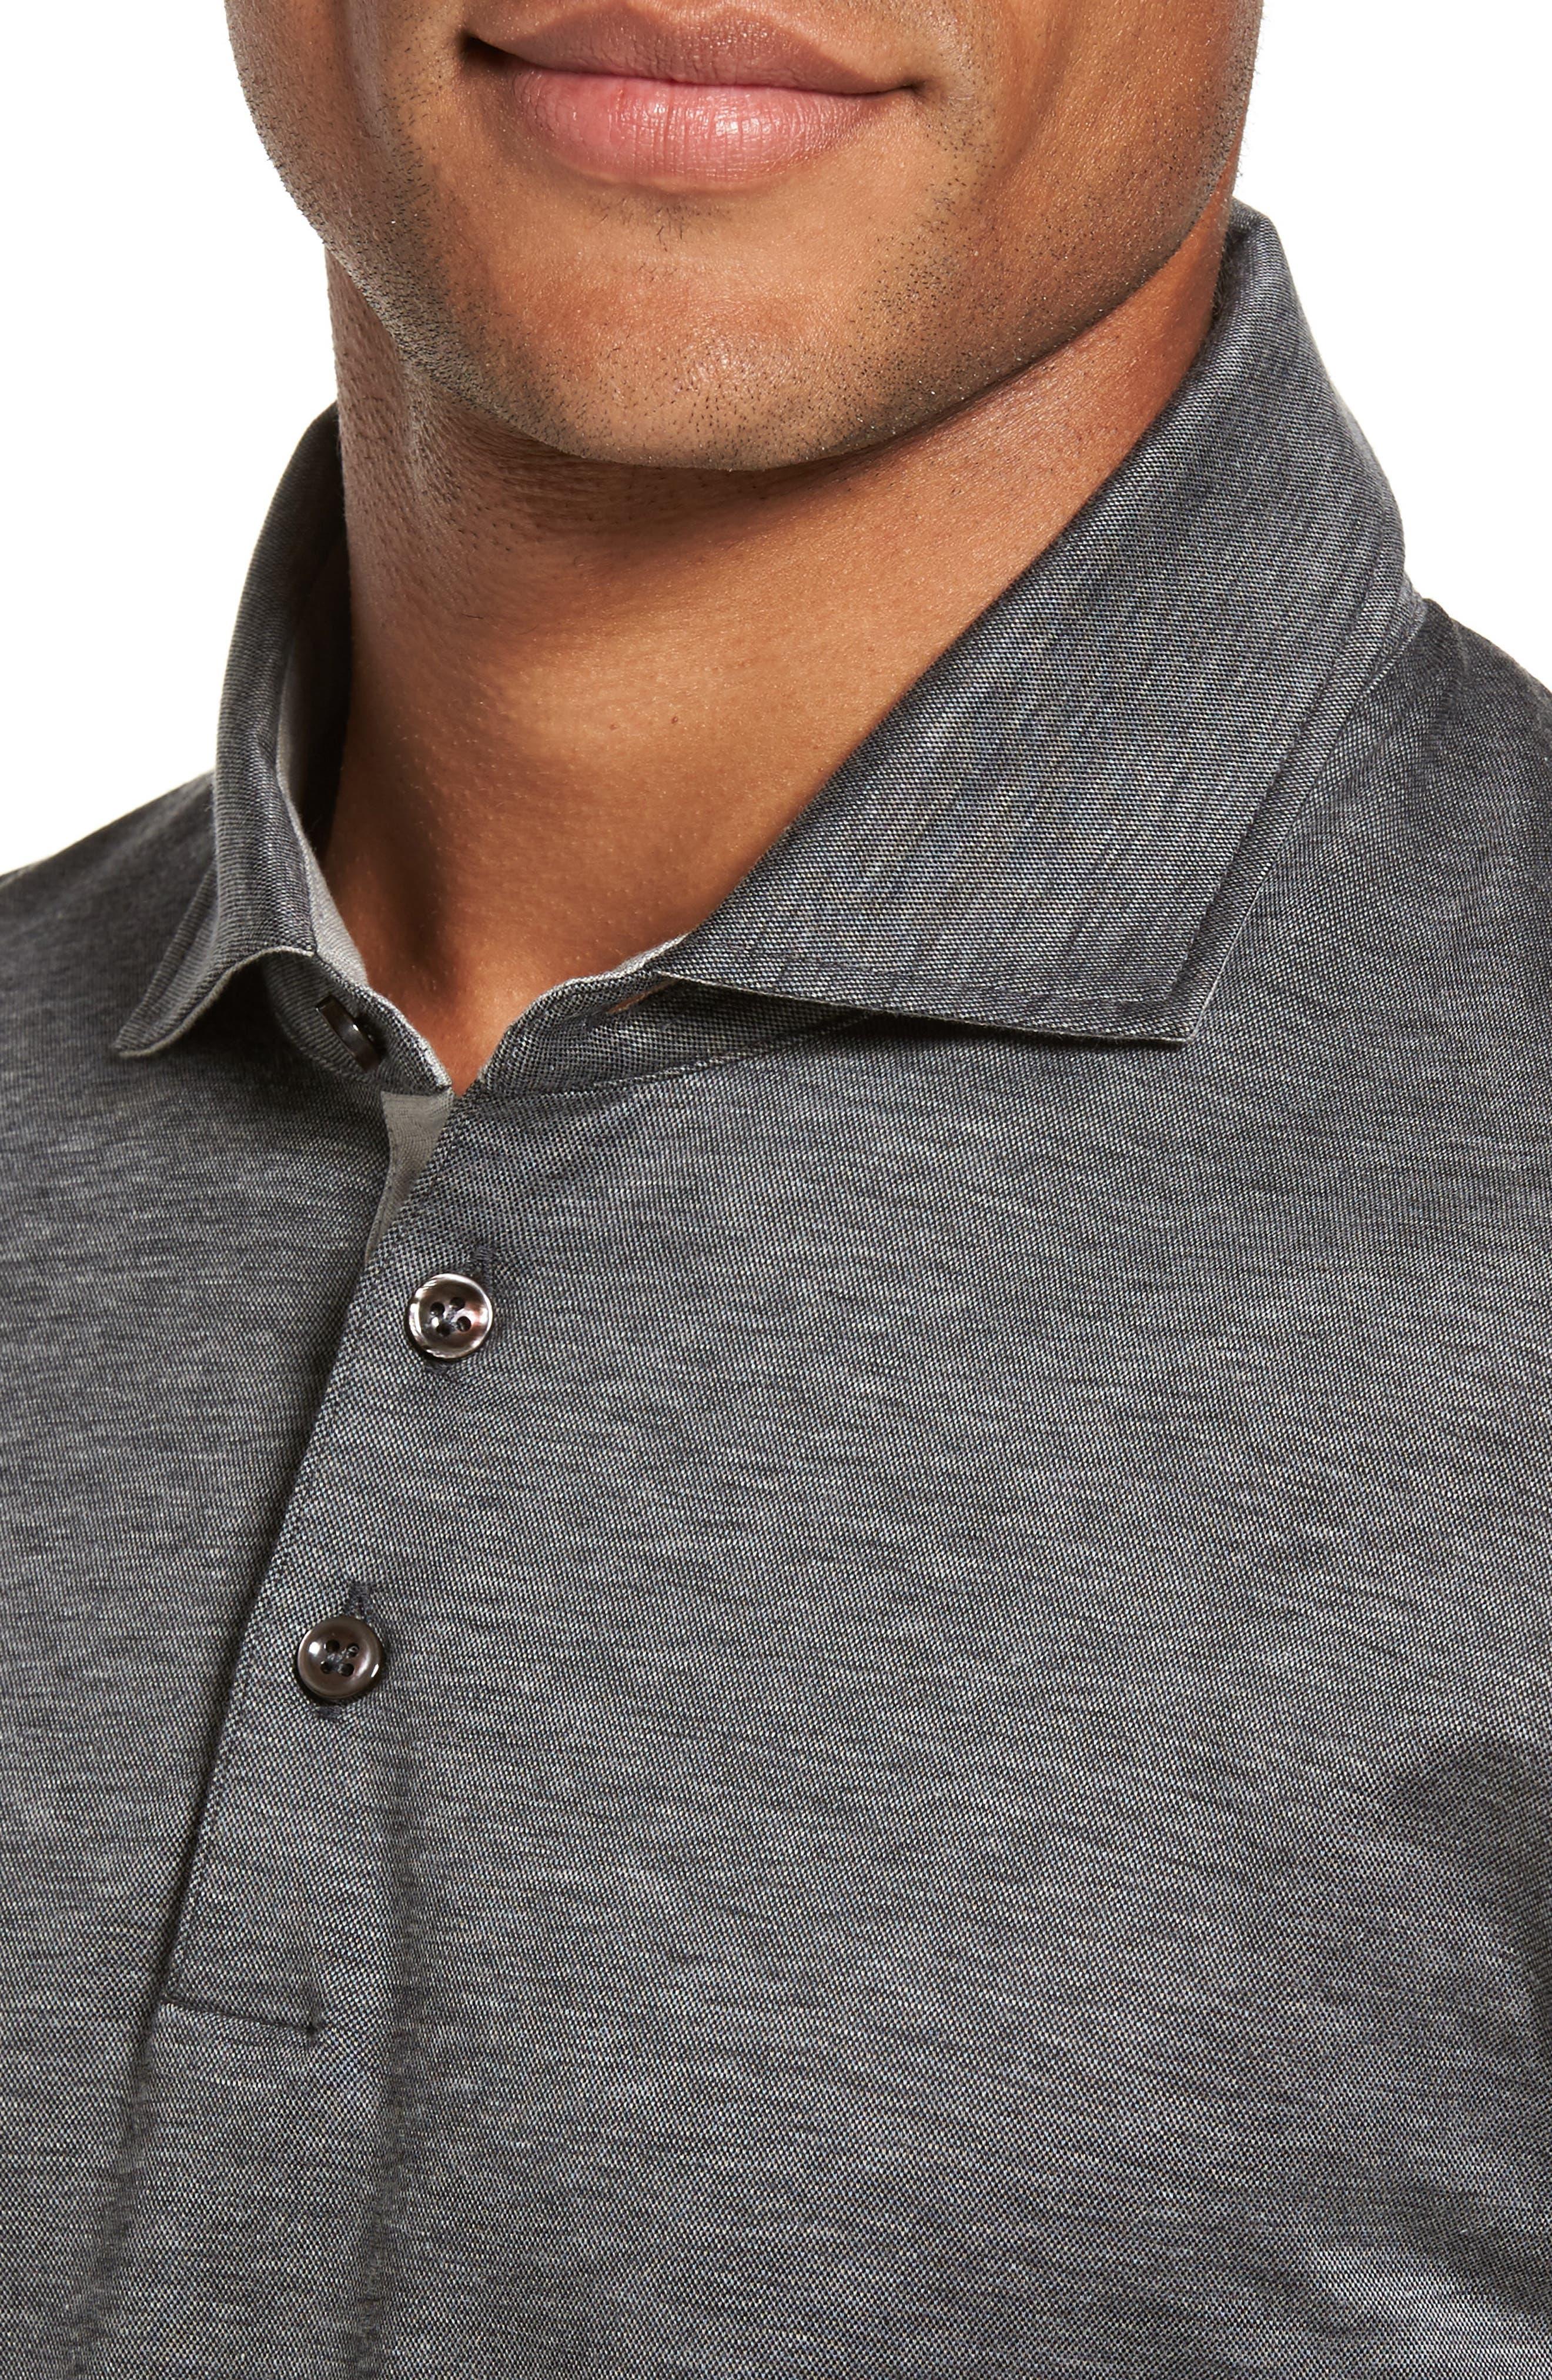 T-Morrison Slim Fit Long Sleeve Polo,                             Alternate thumbnail 4, color,                             Black